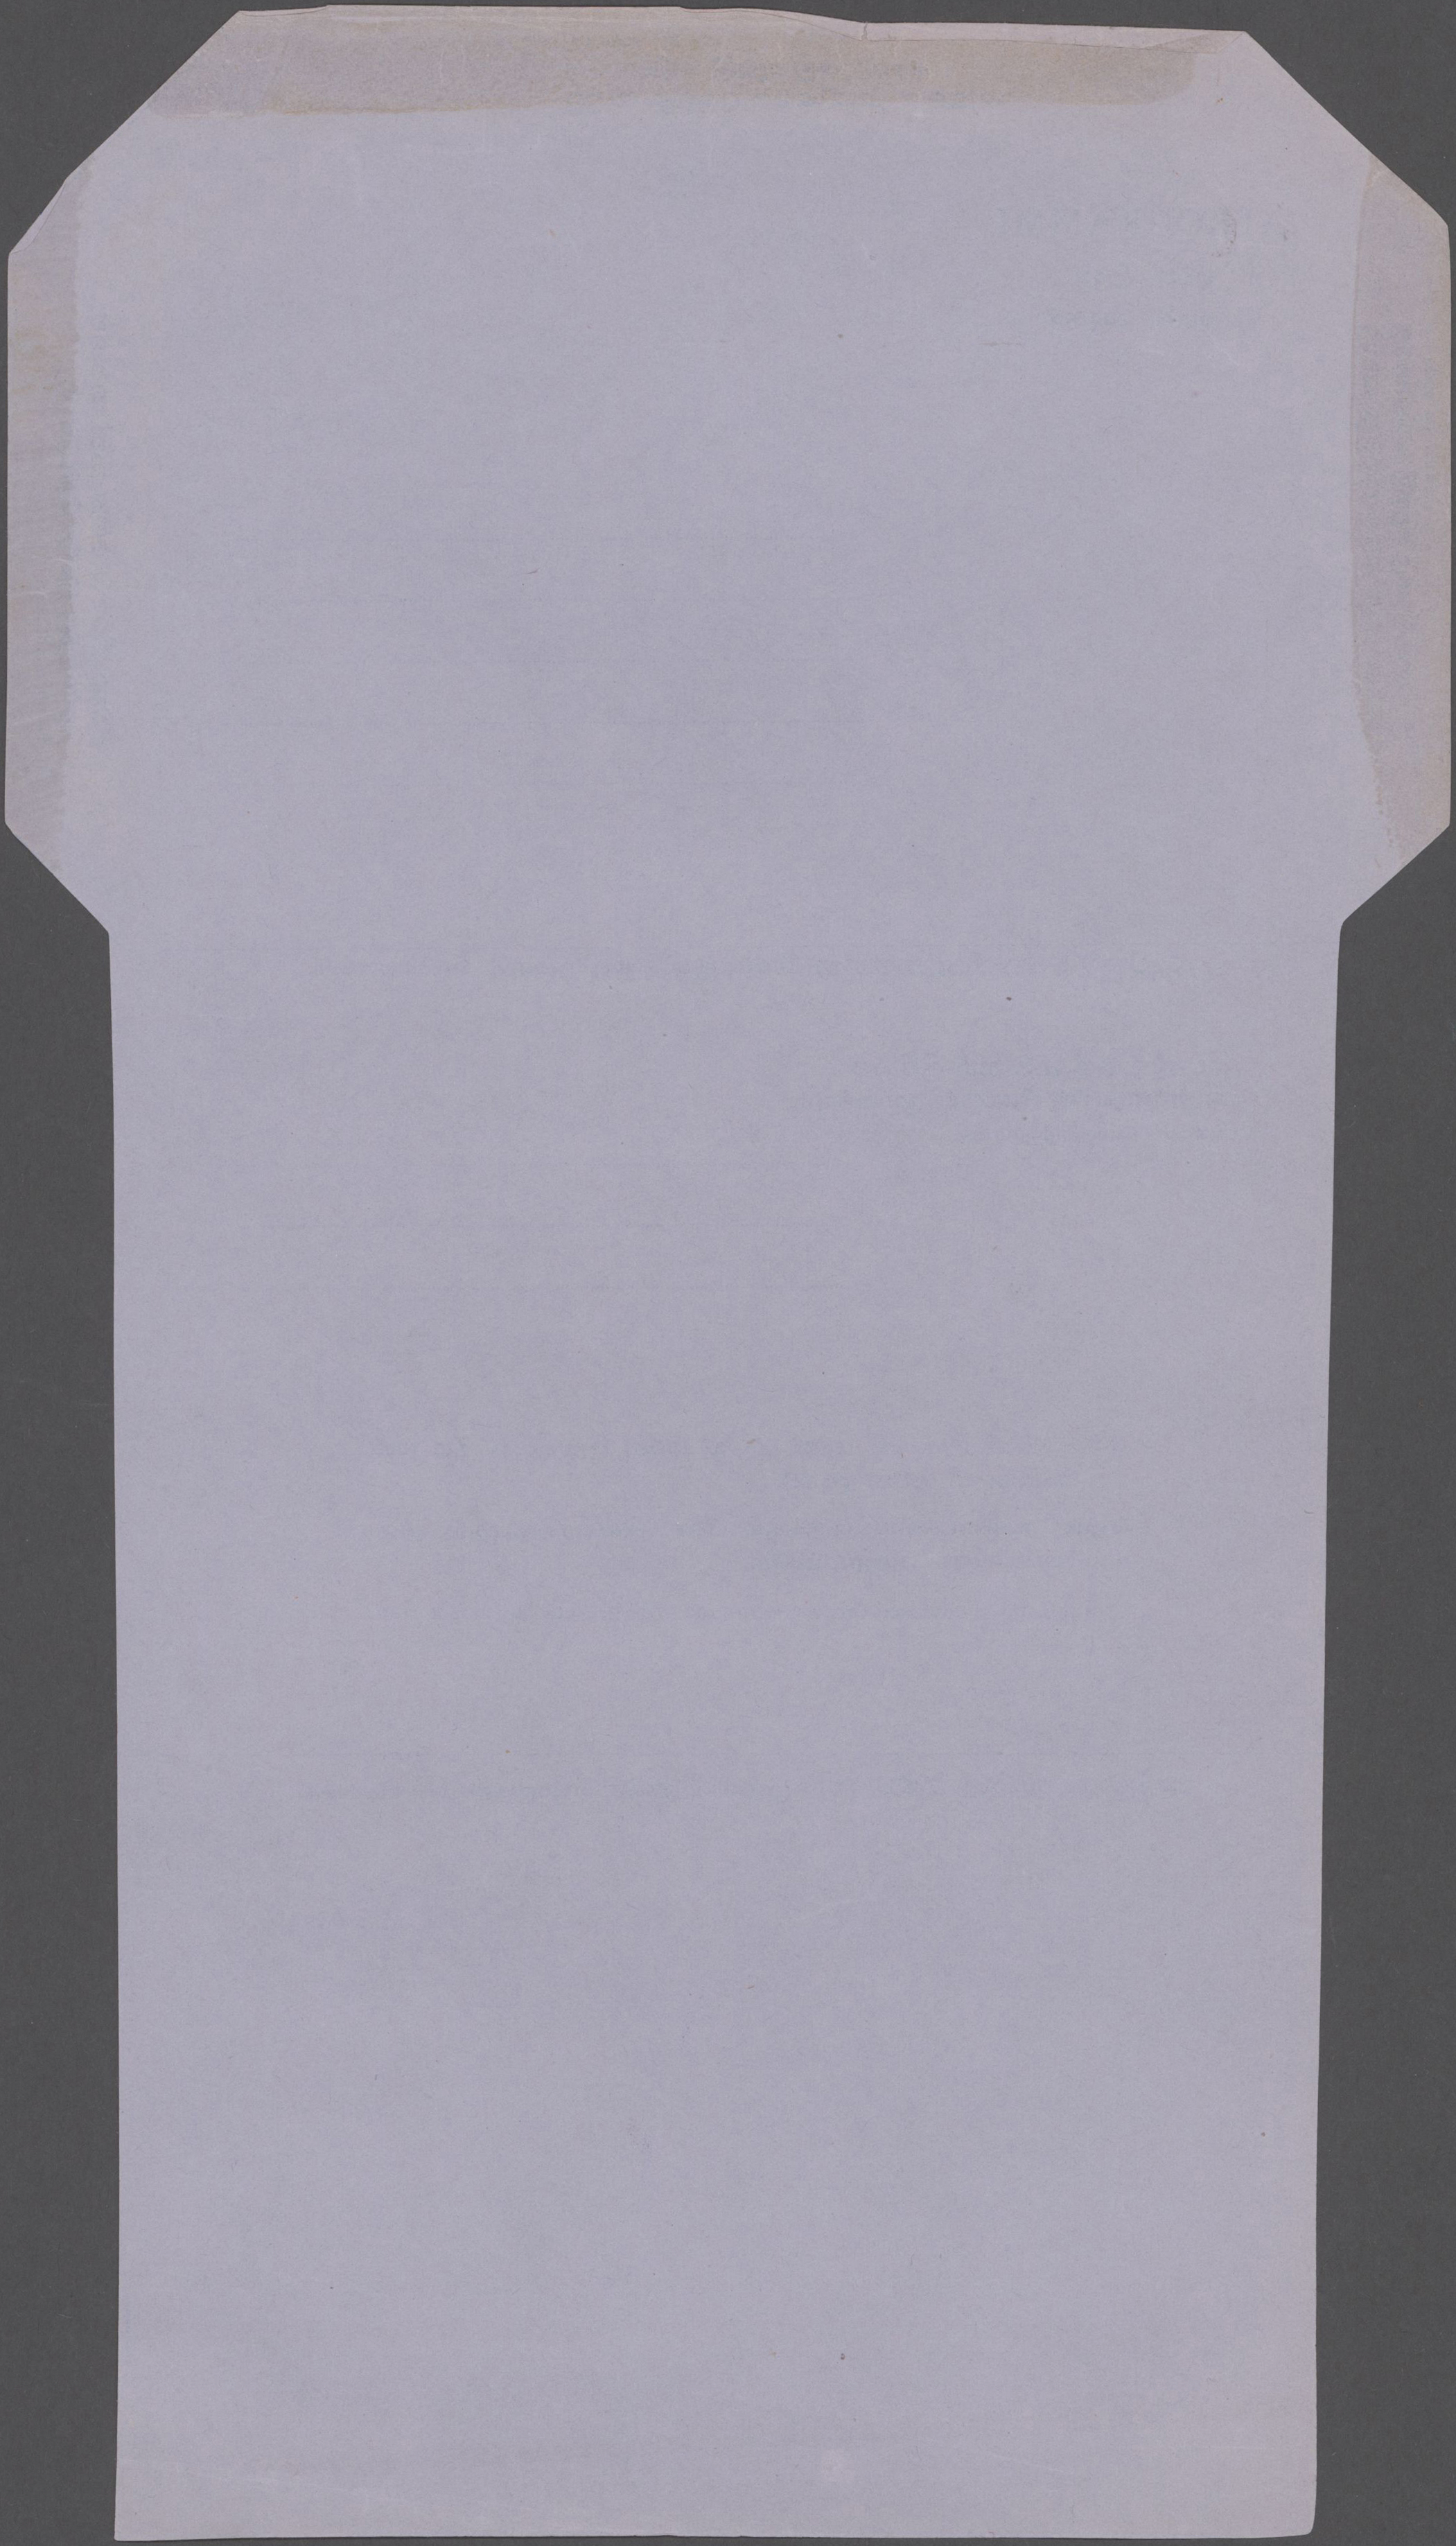 Lot 00006 - Ceylon / Sri Lanka  -  Auktionshaus Christoph Gärtner GmbH & Co. KG Special auction